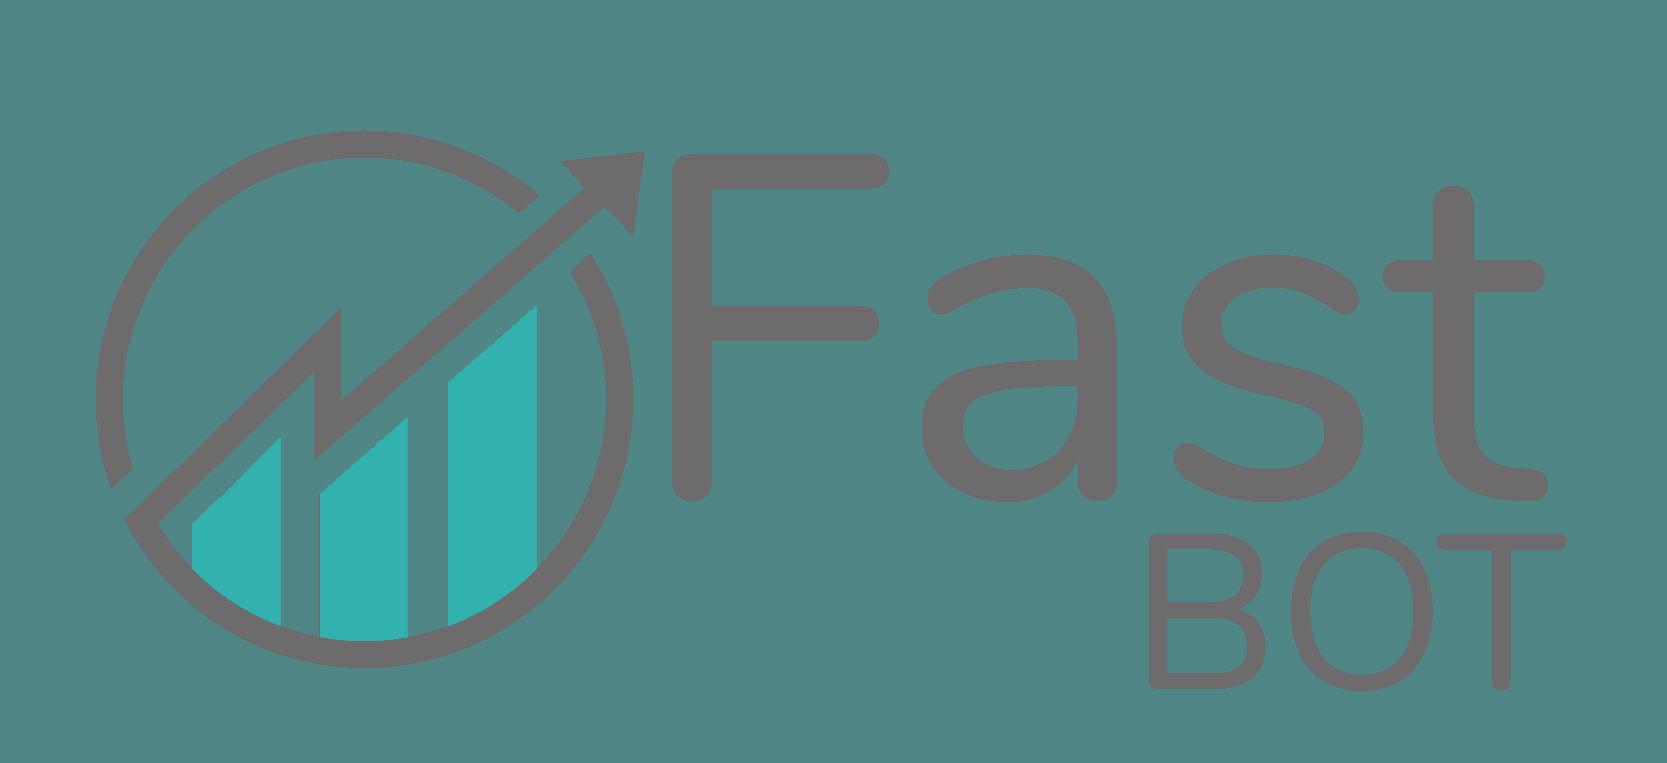 FastBot, a chatbot developer